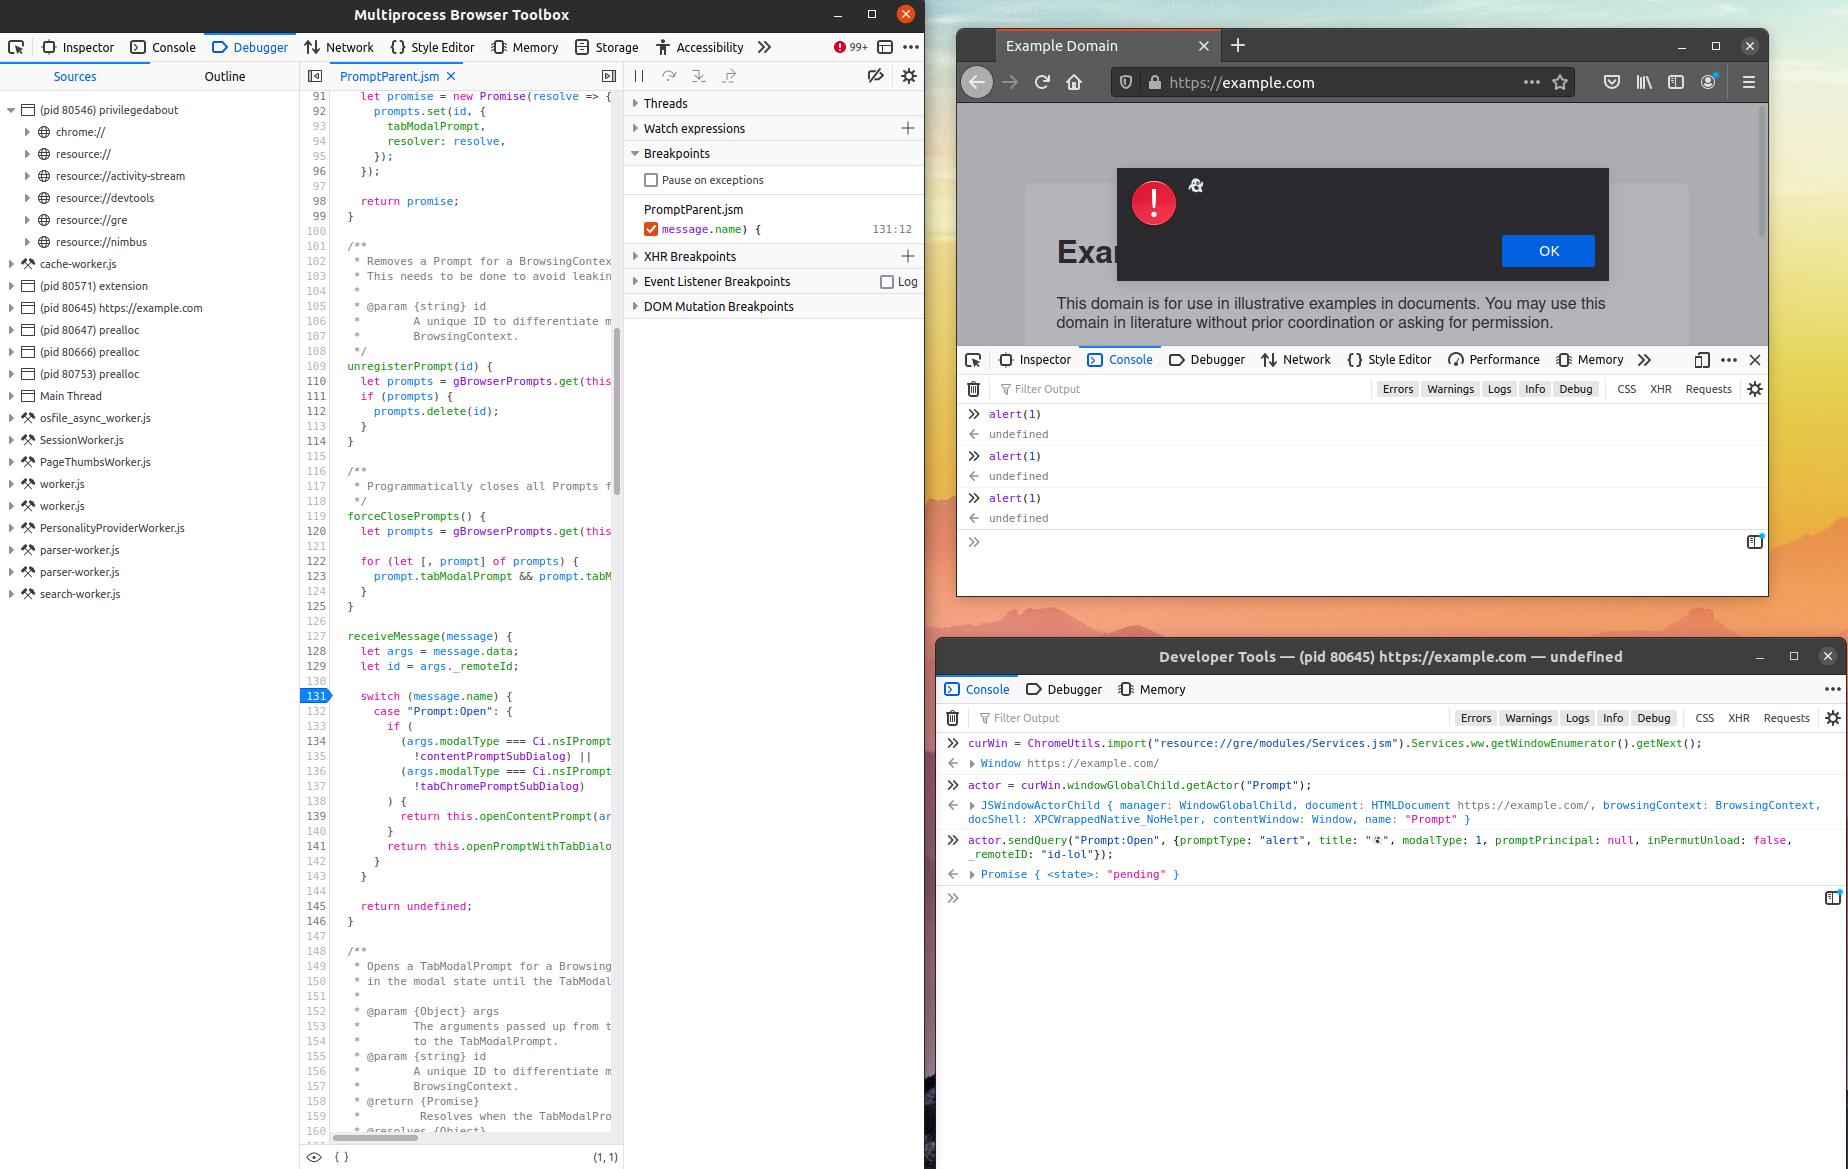 Mozilla Attack & Defense: Examining JavaScript Inter-Process Communication in Firefox